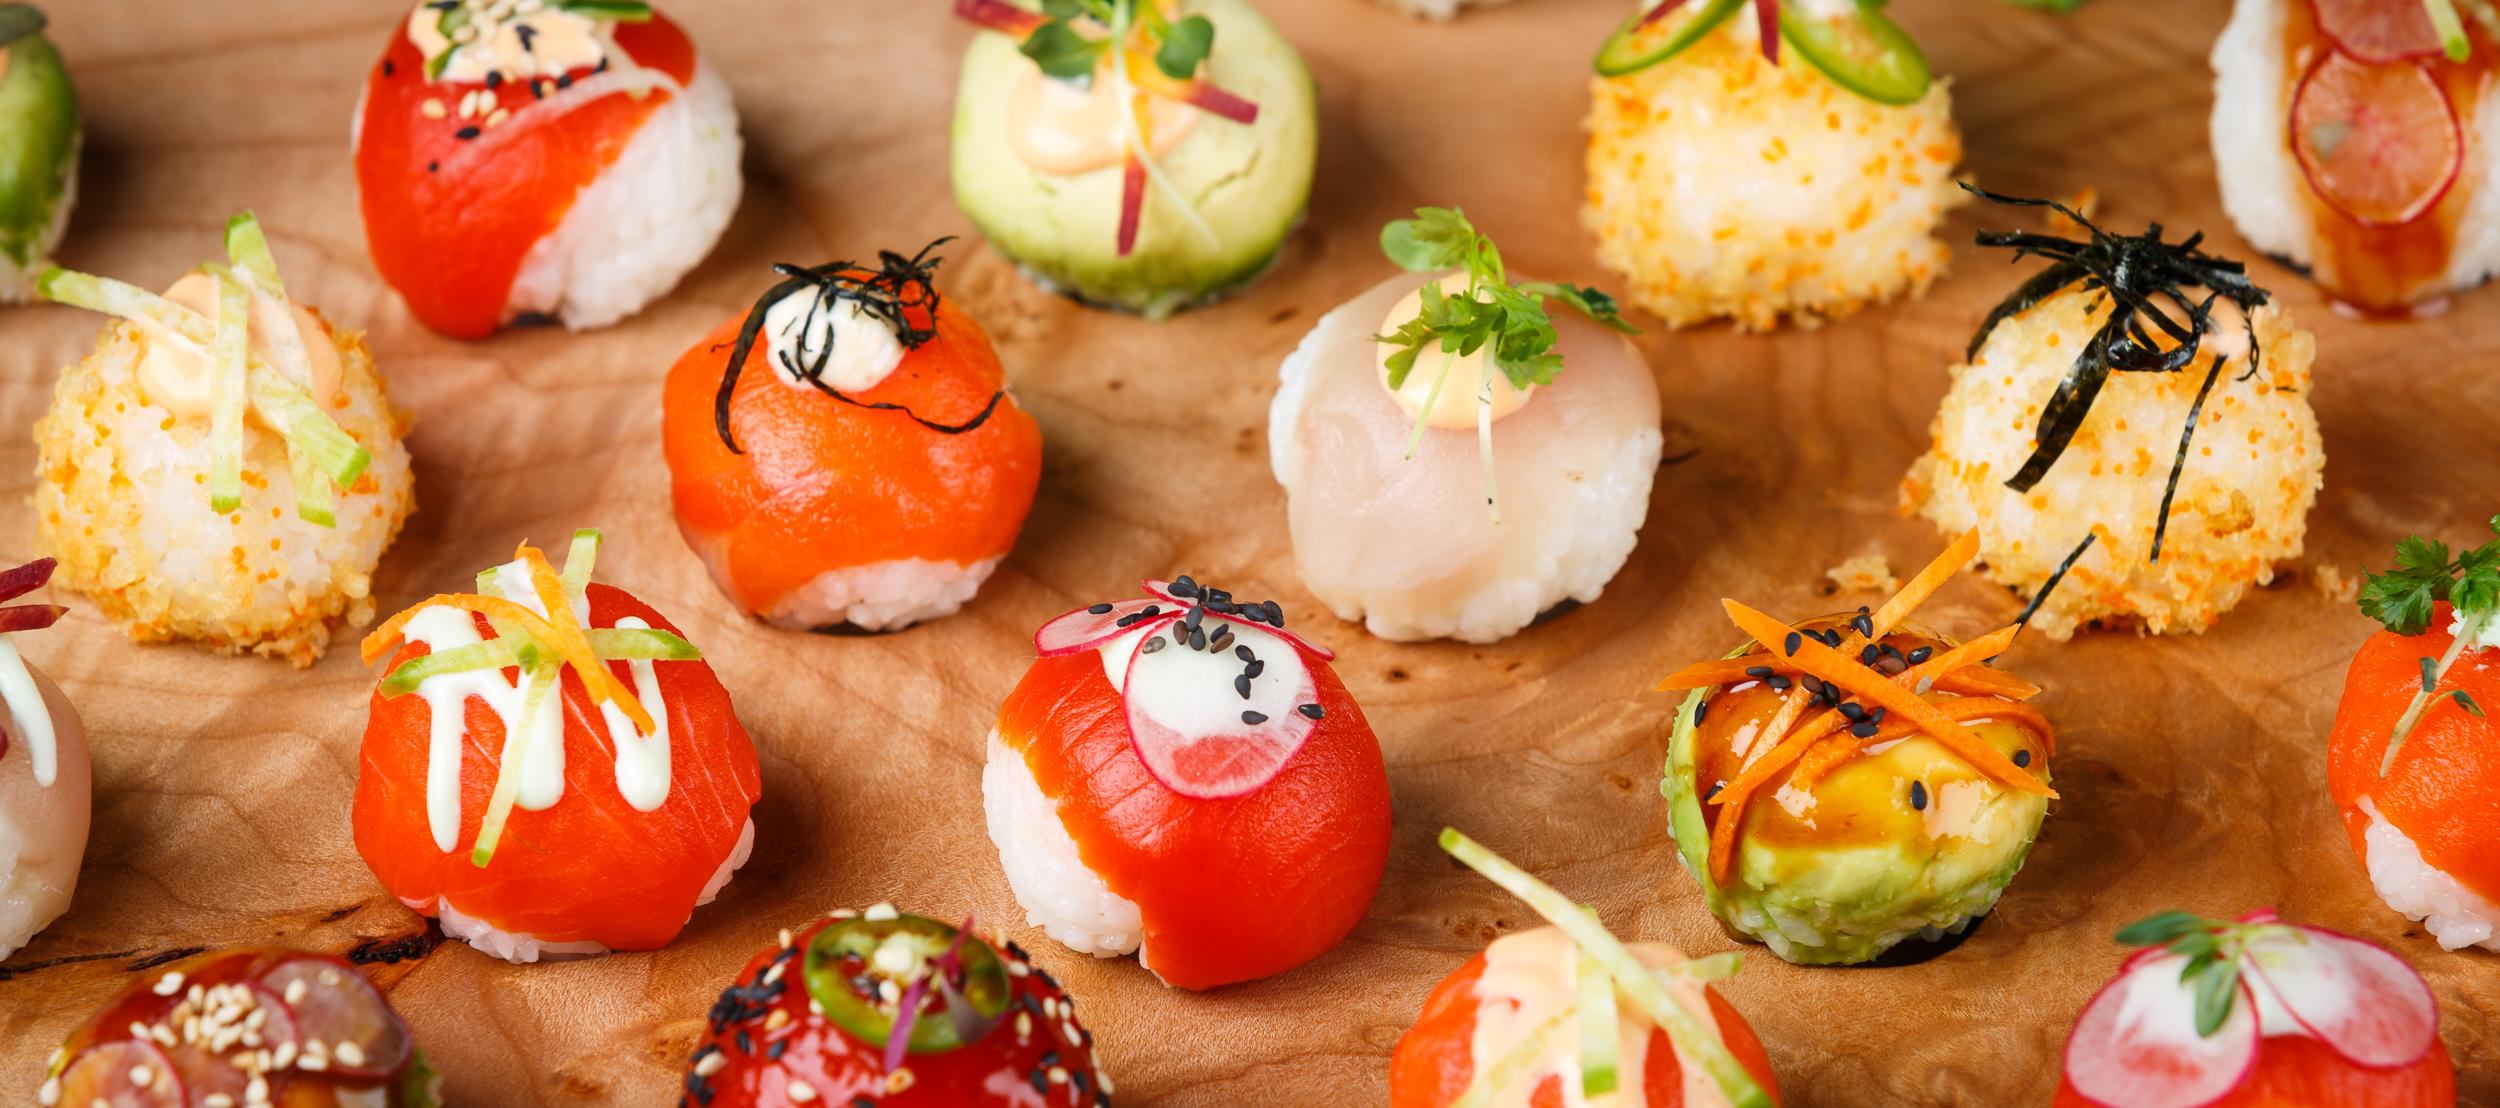 CC-Sushi1.jpg